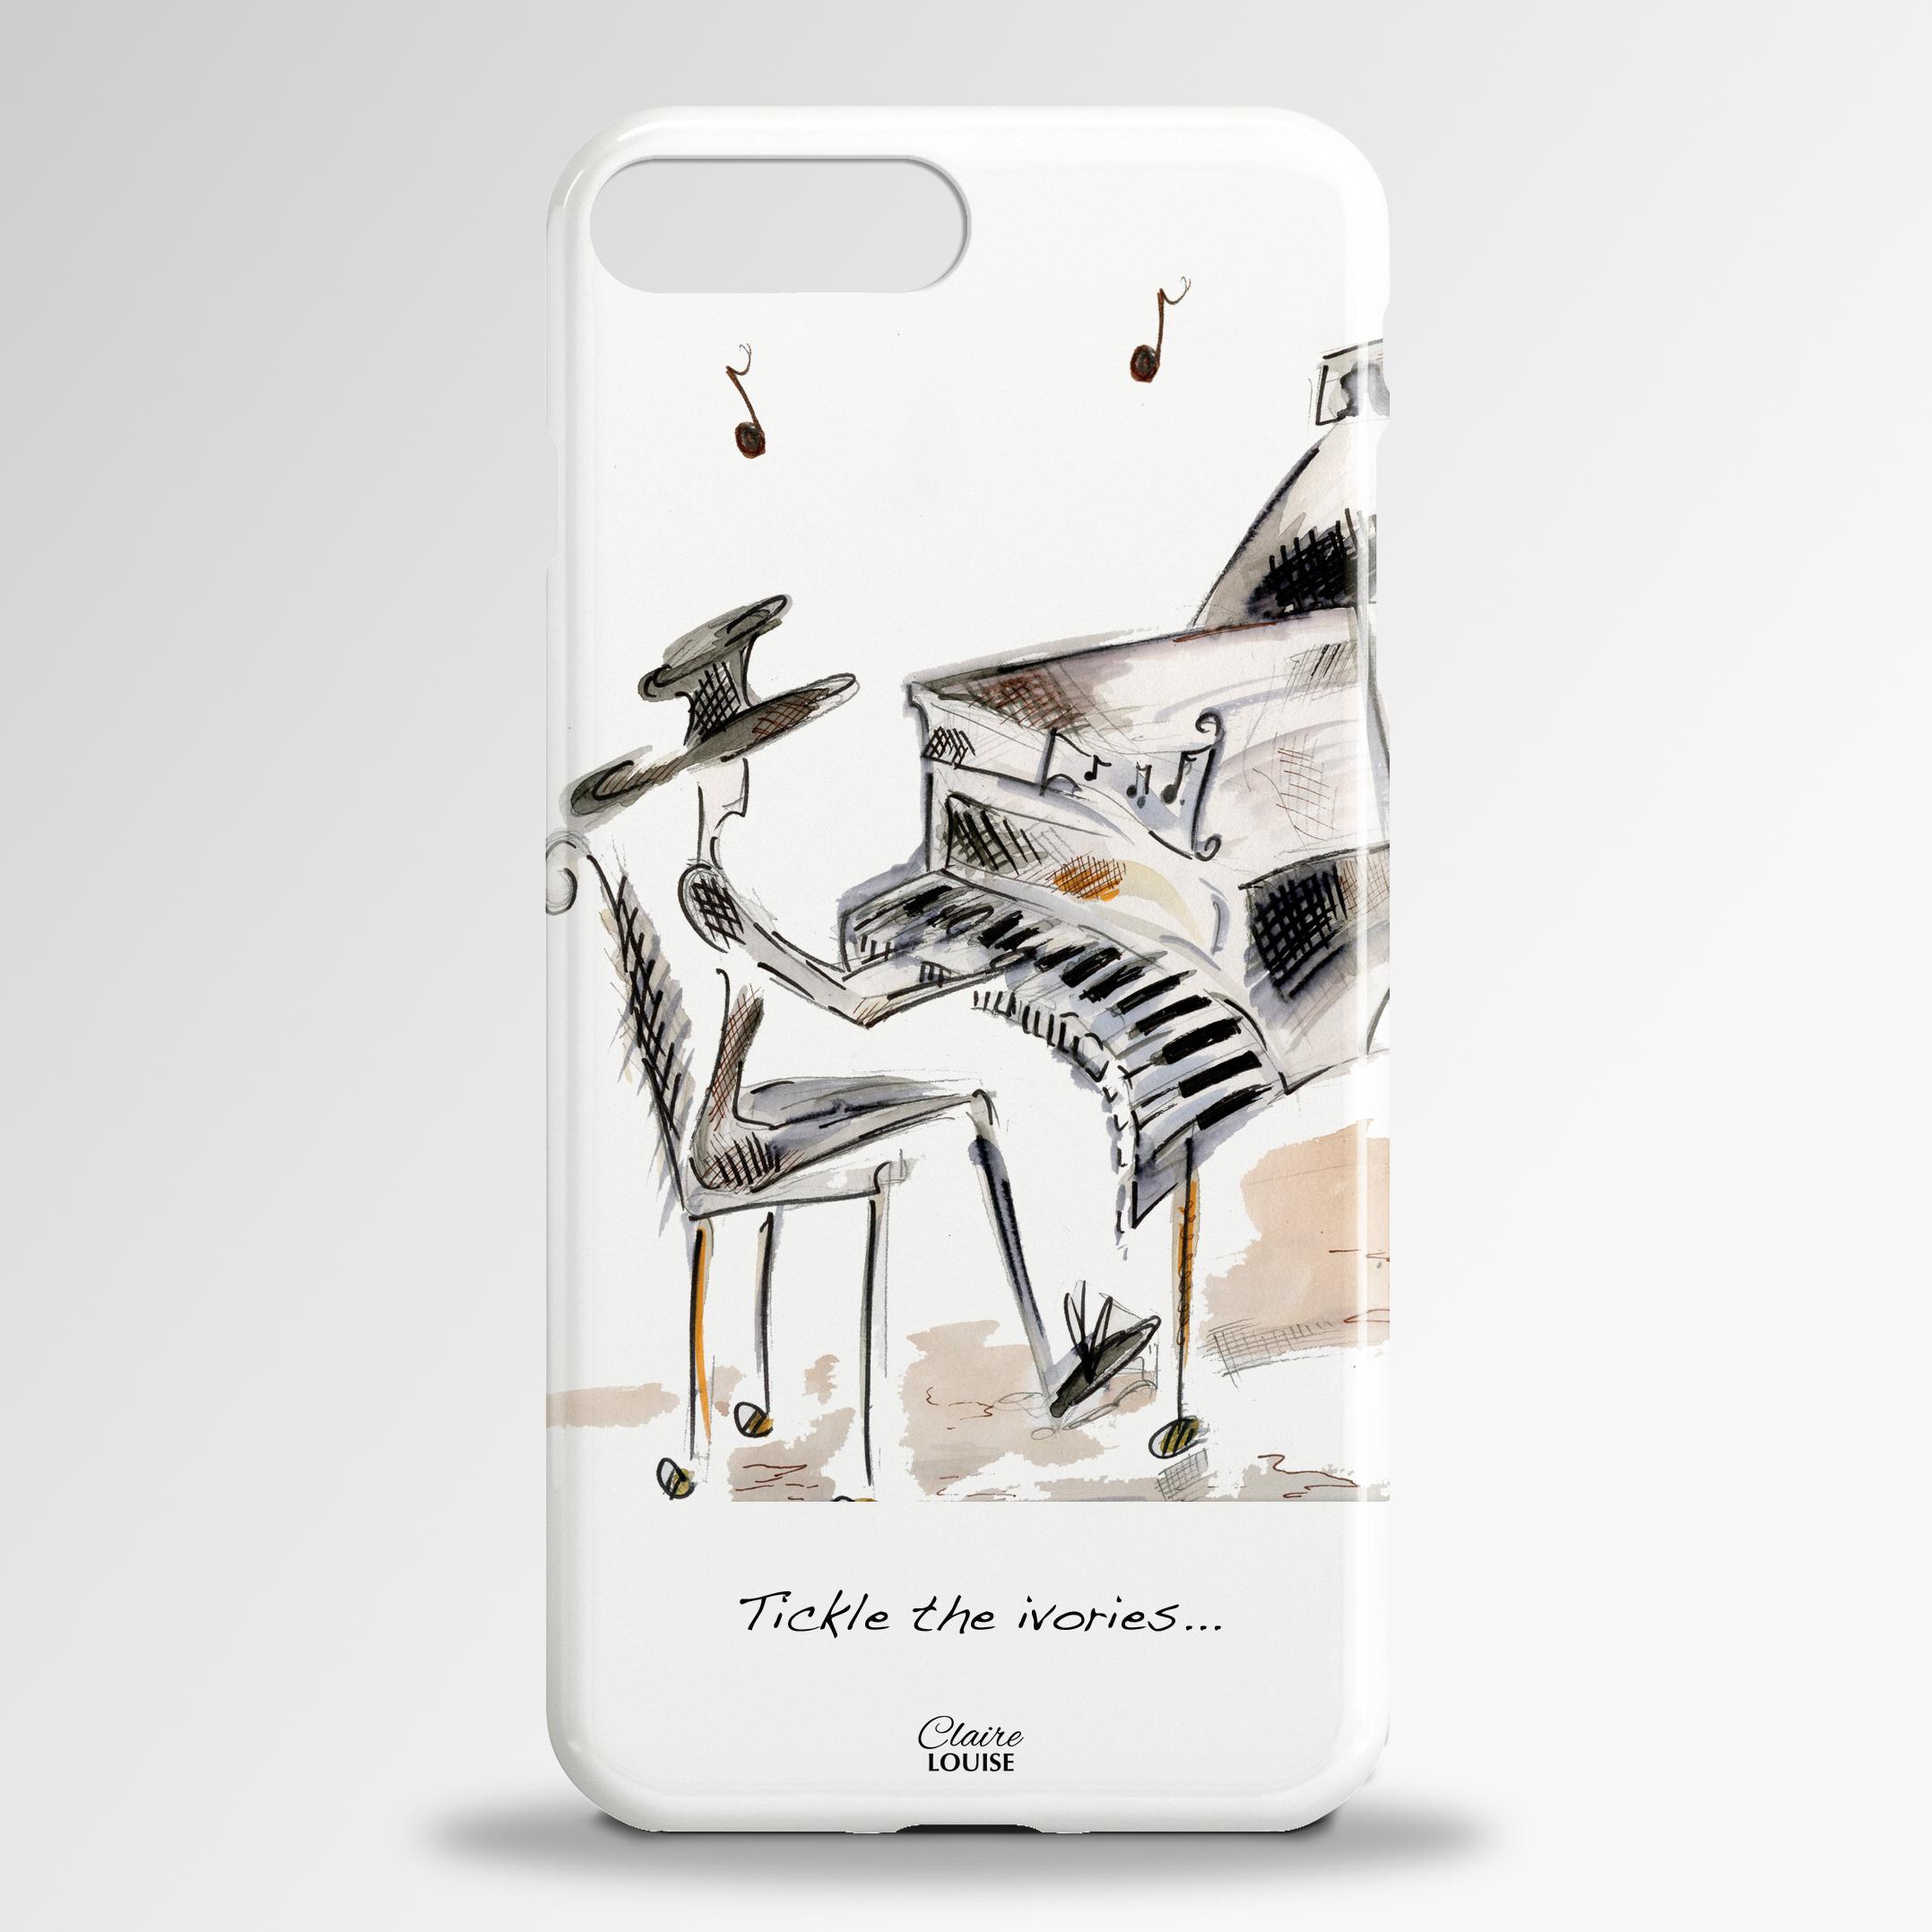 Tickle the Ivories Samsung 3D Phone Case